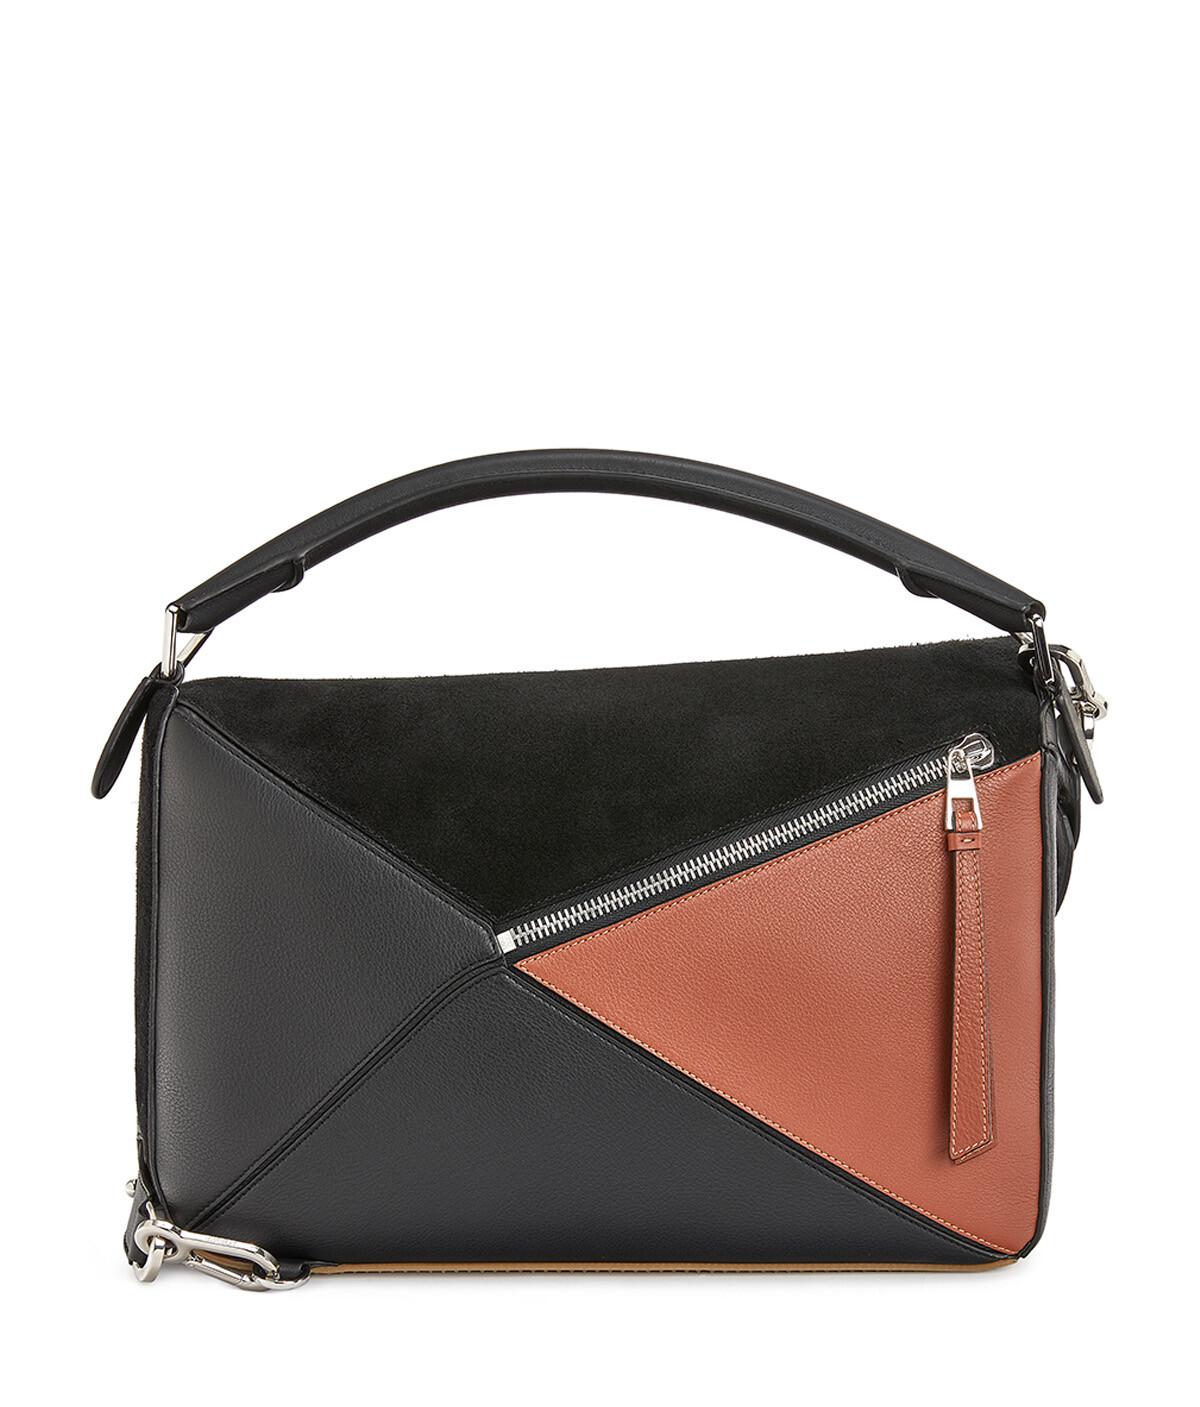 LOEWE Puzzle Trainers Large Bag Black/Tan front